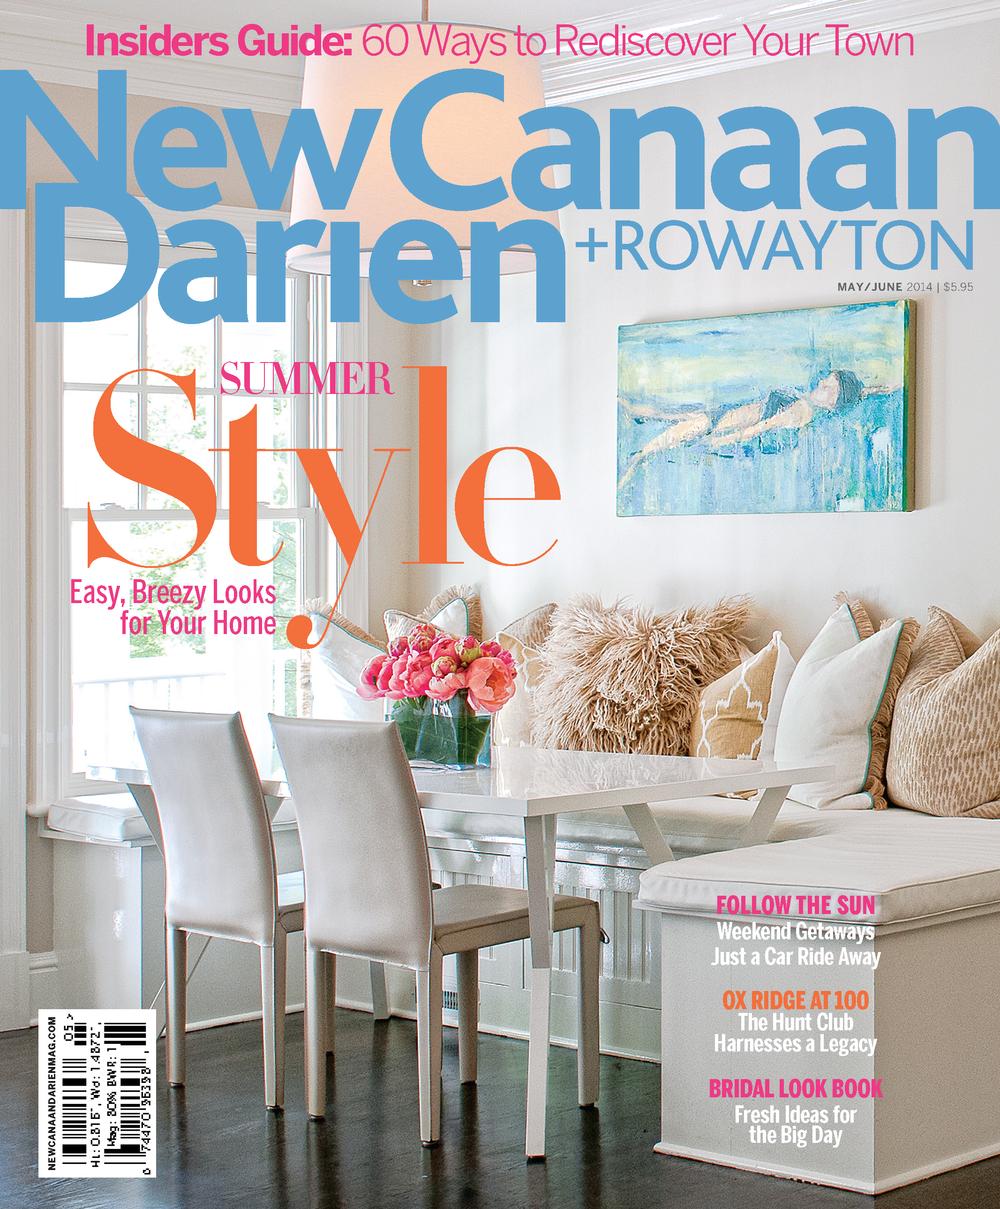 New Canaan, Darien + Rowayton, Cover.png